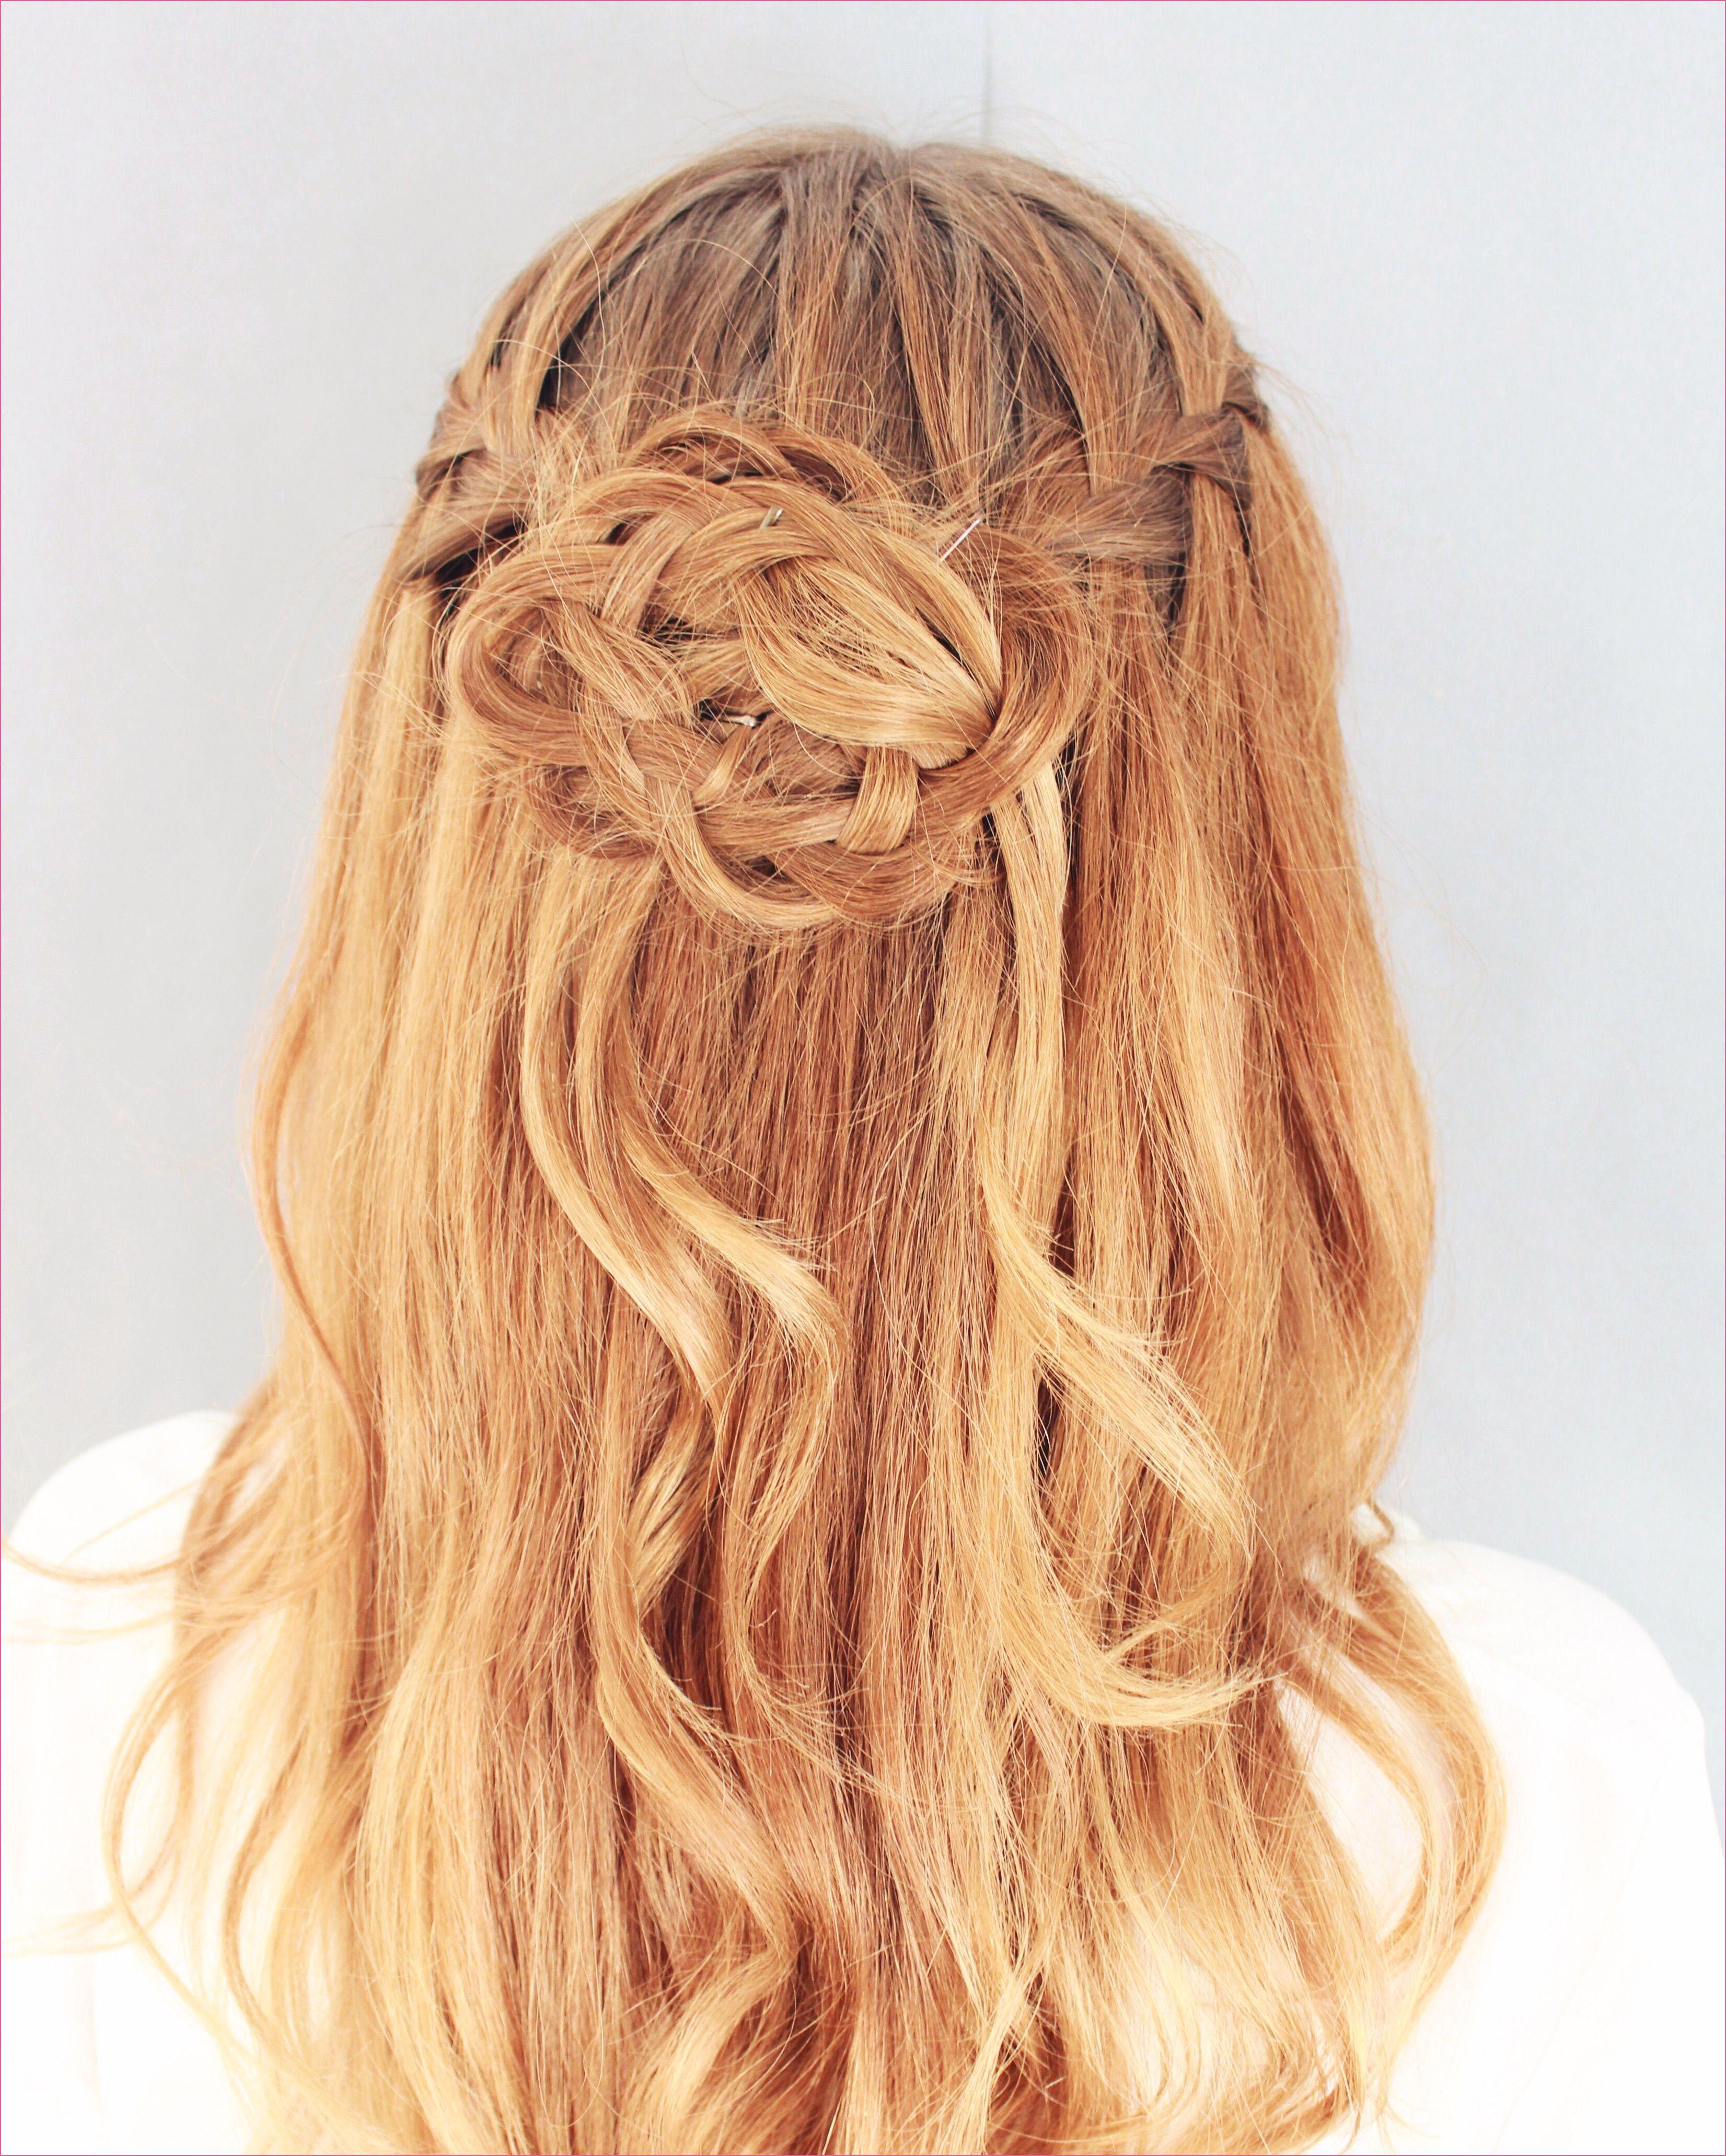 Wasserfall Zopf Kurze Haare In 2020 Wasserfall Frisur Lange Haare Zopf Kurze Haare